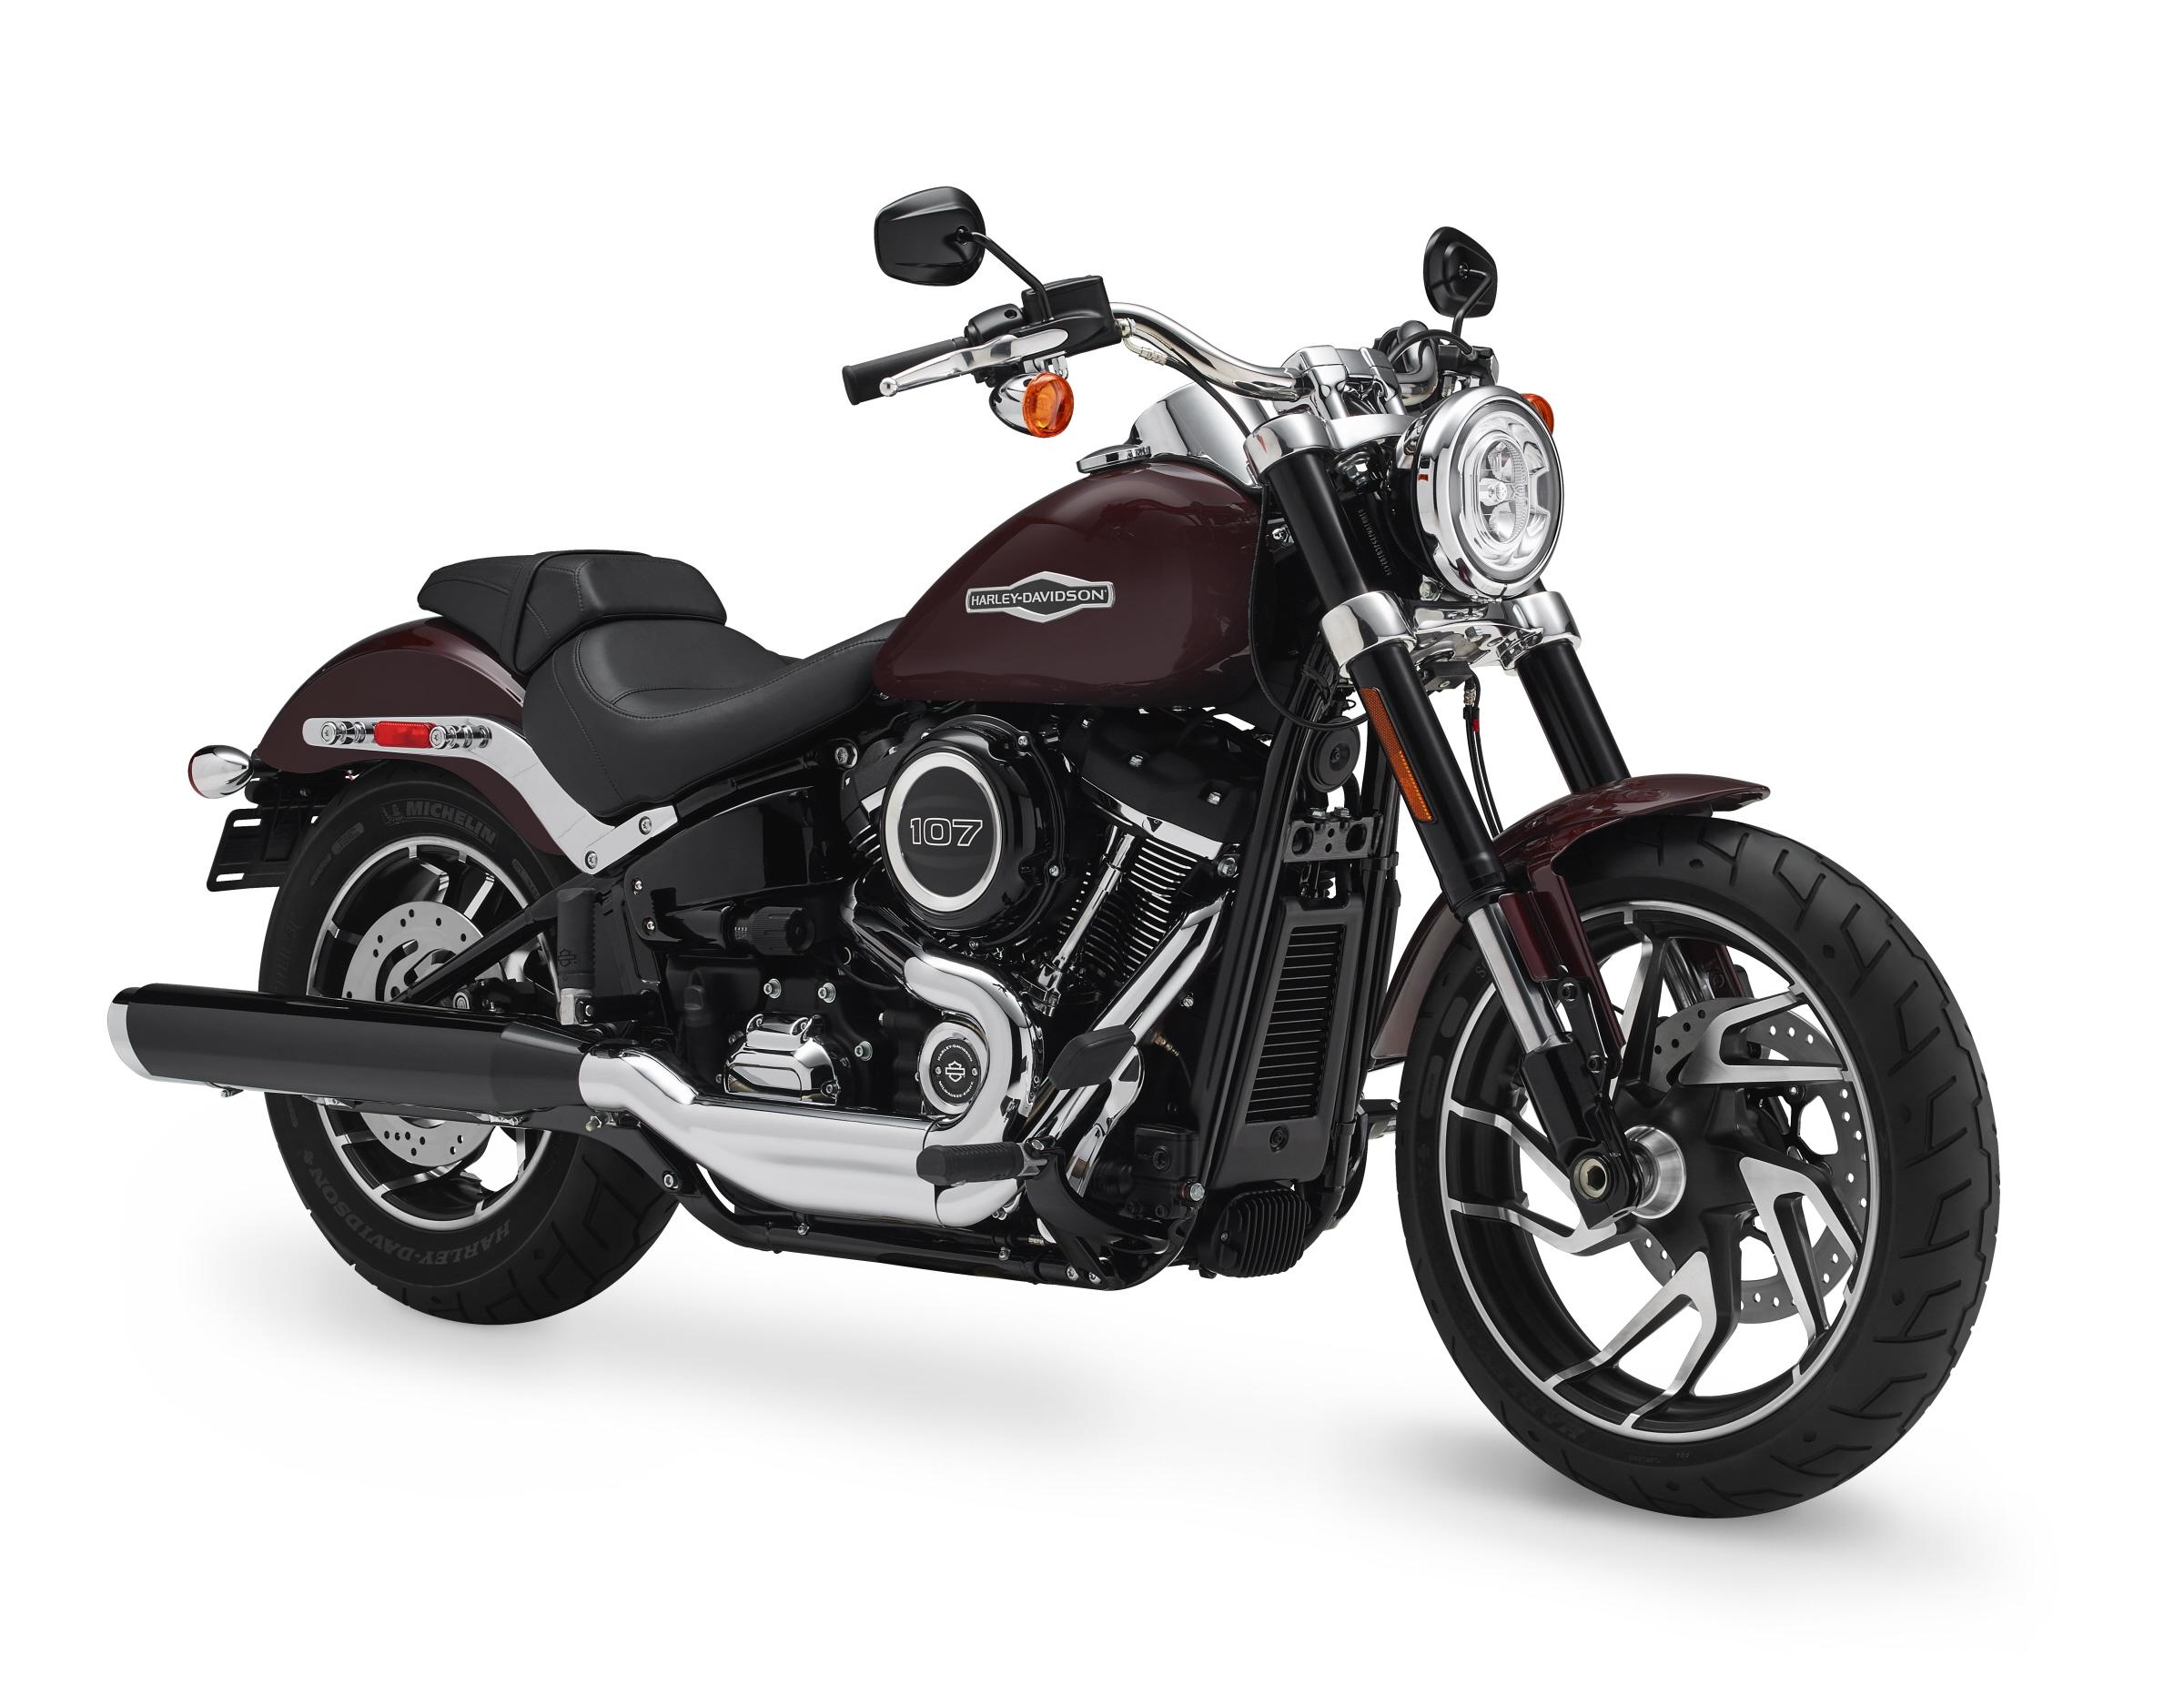 2018 (And A Half) Harley-Davidson Sport Glide | Cycle World